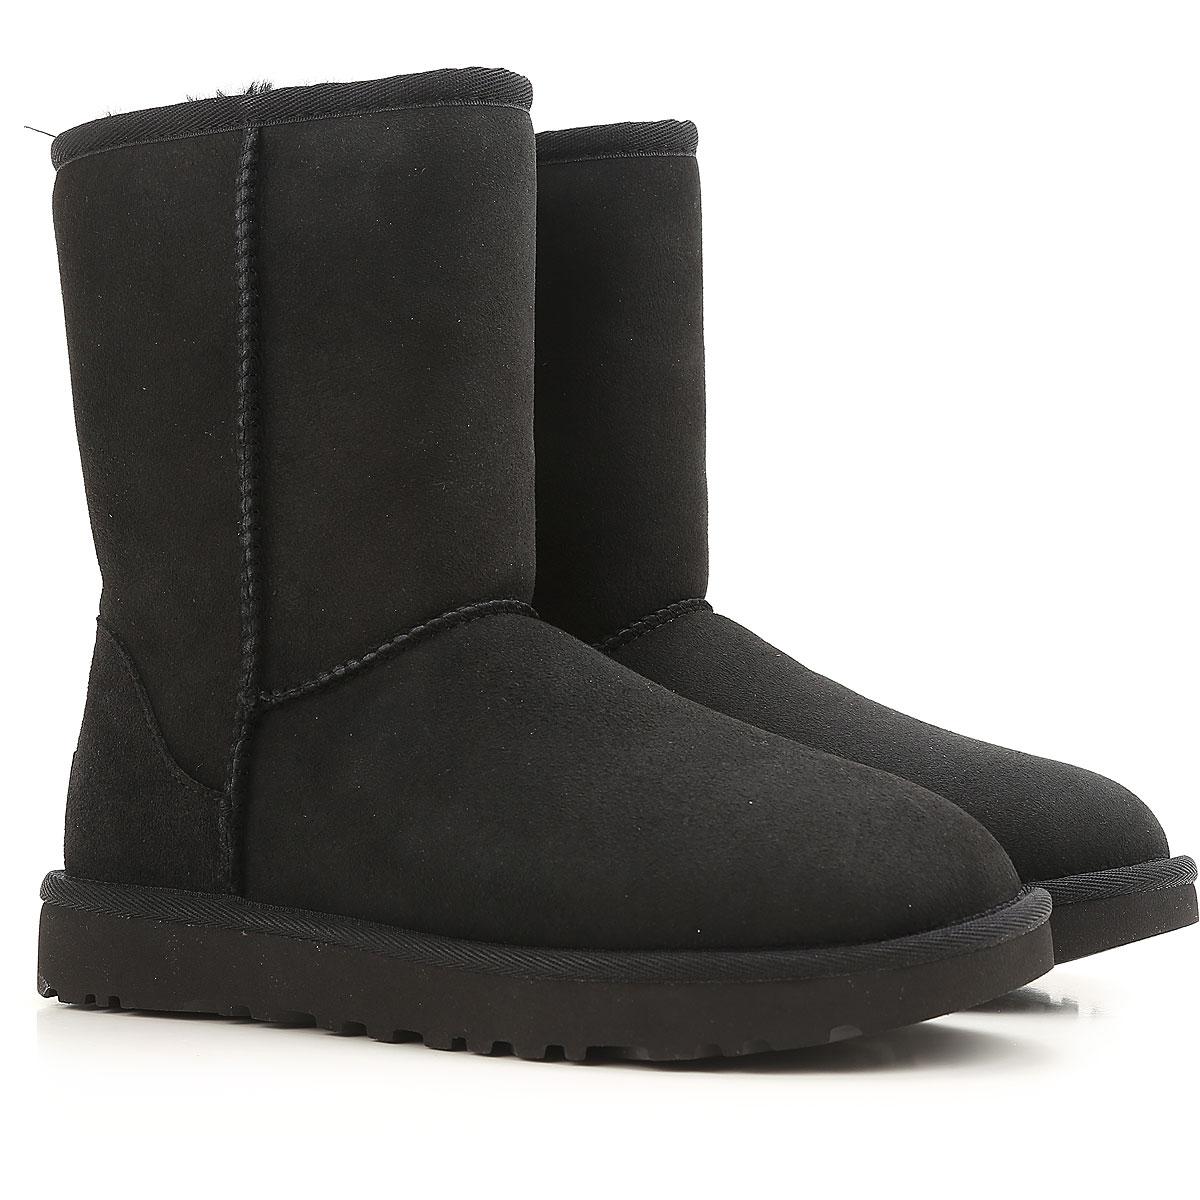 Ugg Boots For Women, Booties On Sale, Black, Suede, 2019, Eur 38 - Us 7 Usa 6  Uk 4 5  Eu 37  Japan 230 Usa 9  Uk 7 5  Eu 40  Japan 260